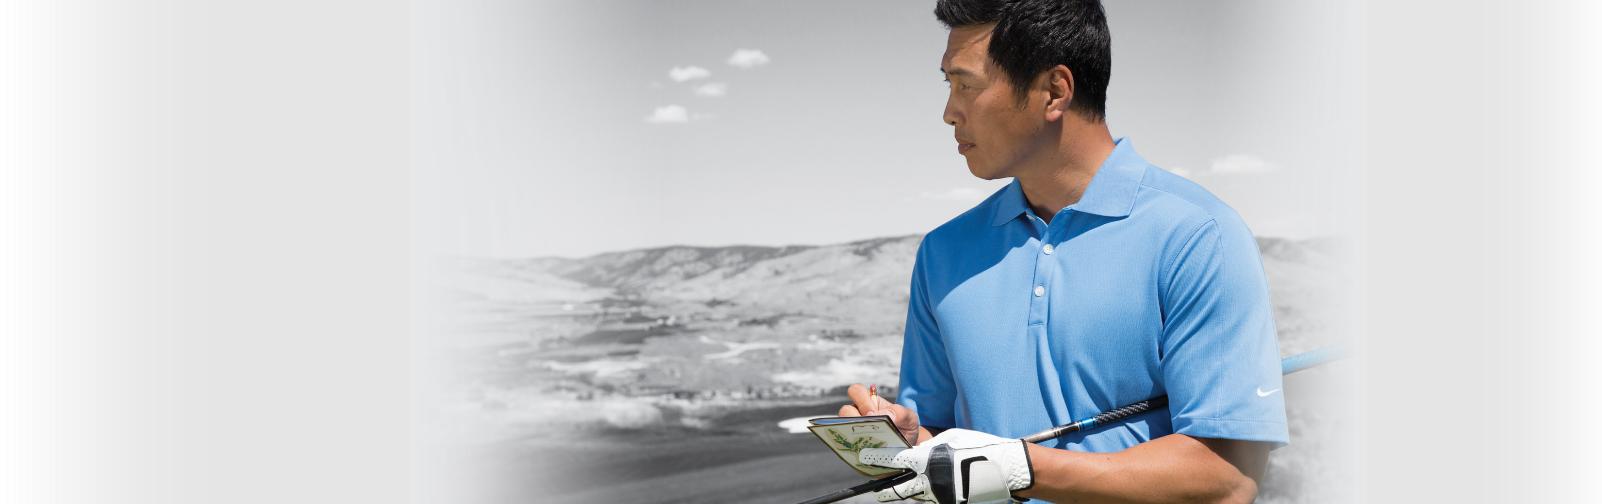 Background Image - Golfer